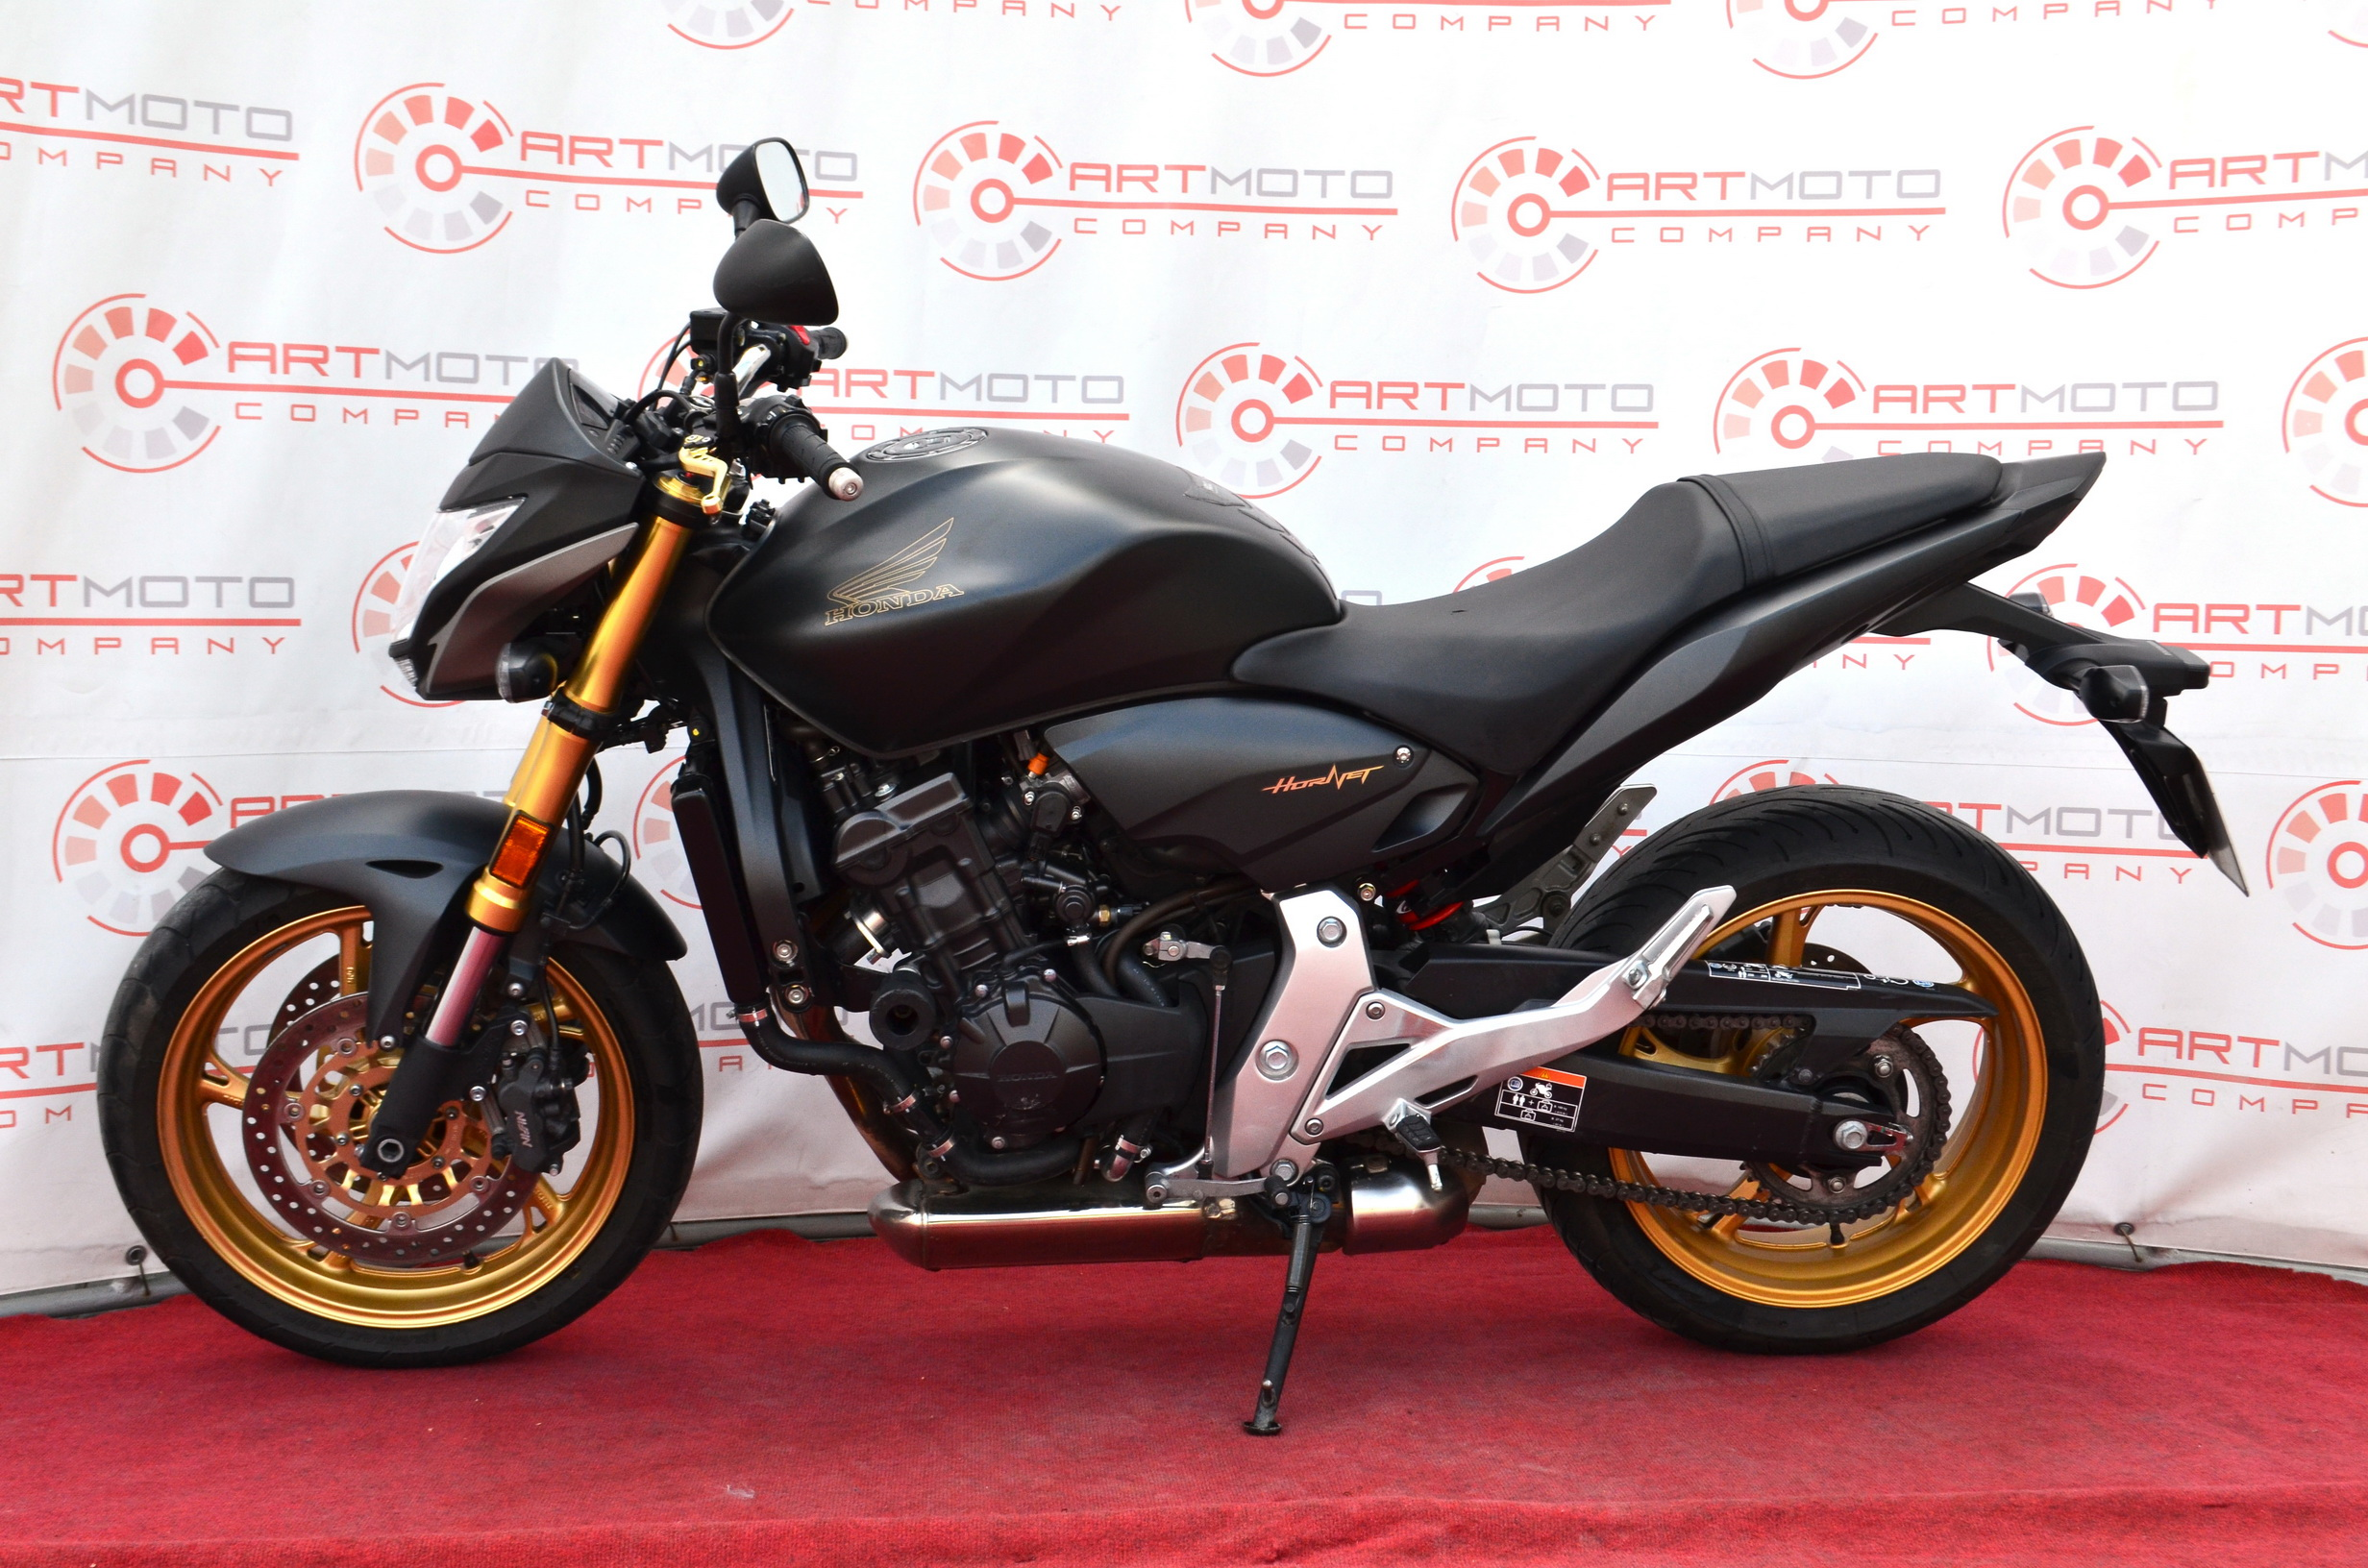 МОТОЦИКЛ HONDA HORNET 600  Артмото - купить квадроцикл в украине и харькове, мотоцикл, снегоход, скутер, мопед, электромобиль